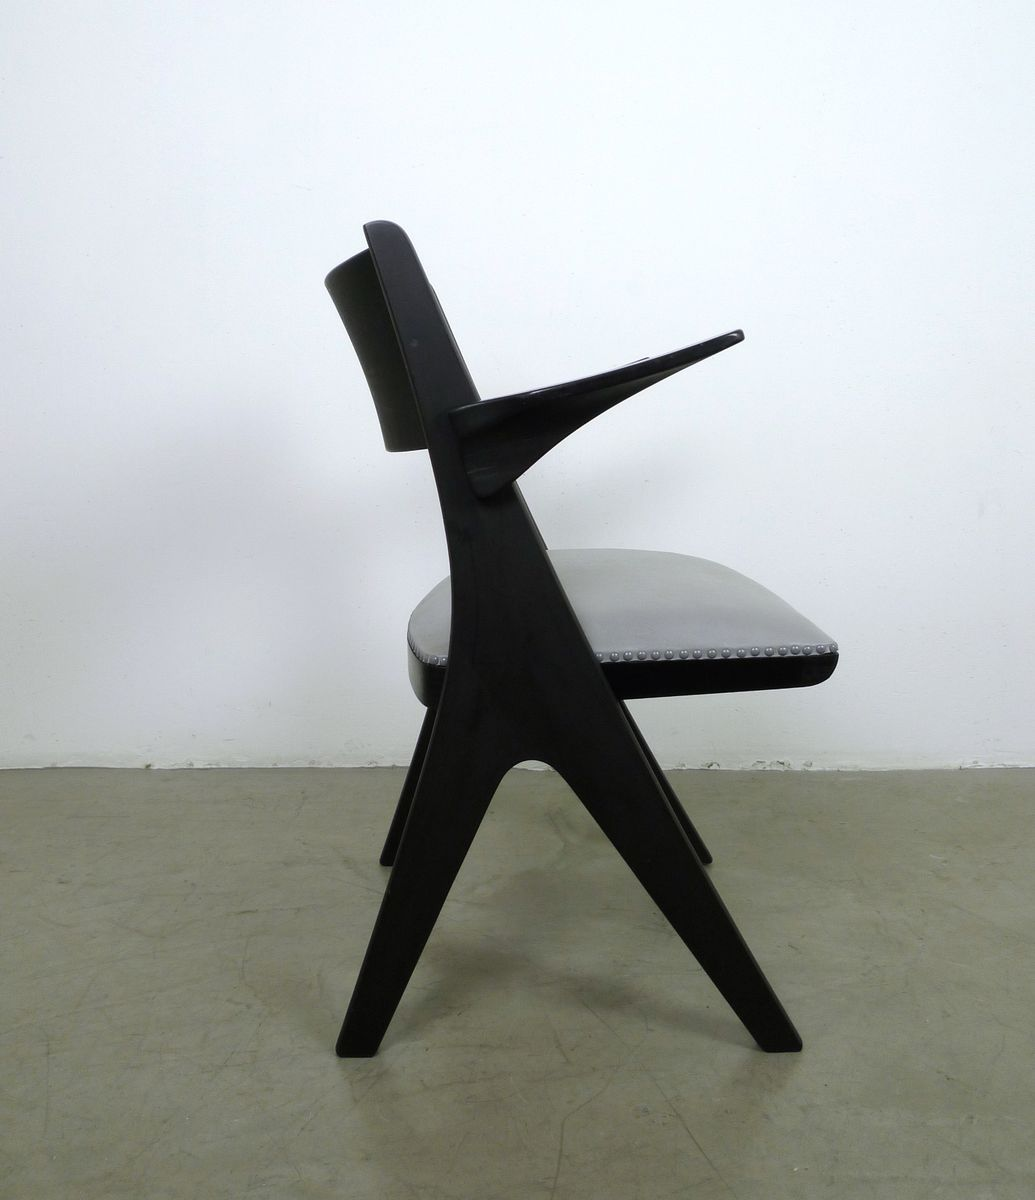 grauer sessel modell penguin von carl sasse f r casala 1950er bei pamono kaufen. Black Bedroom Furniture Sets. Home Design Ideas